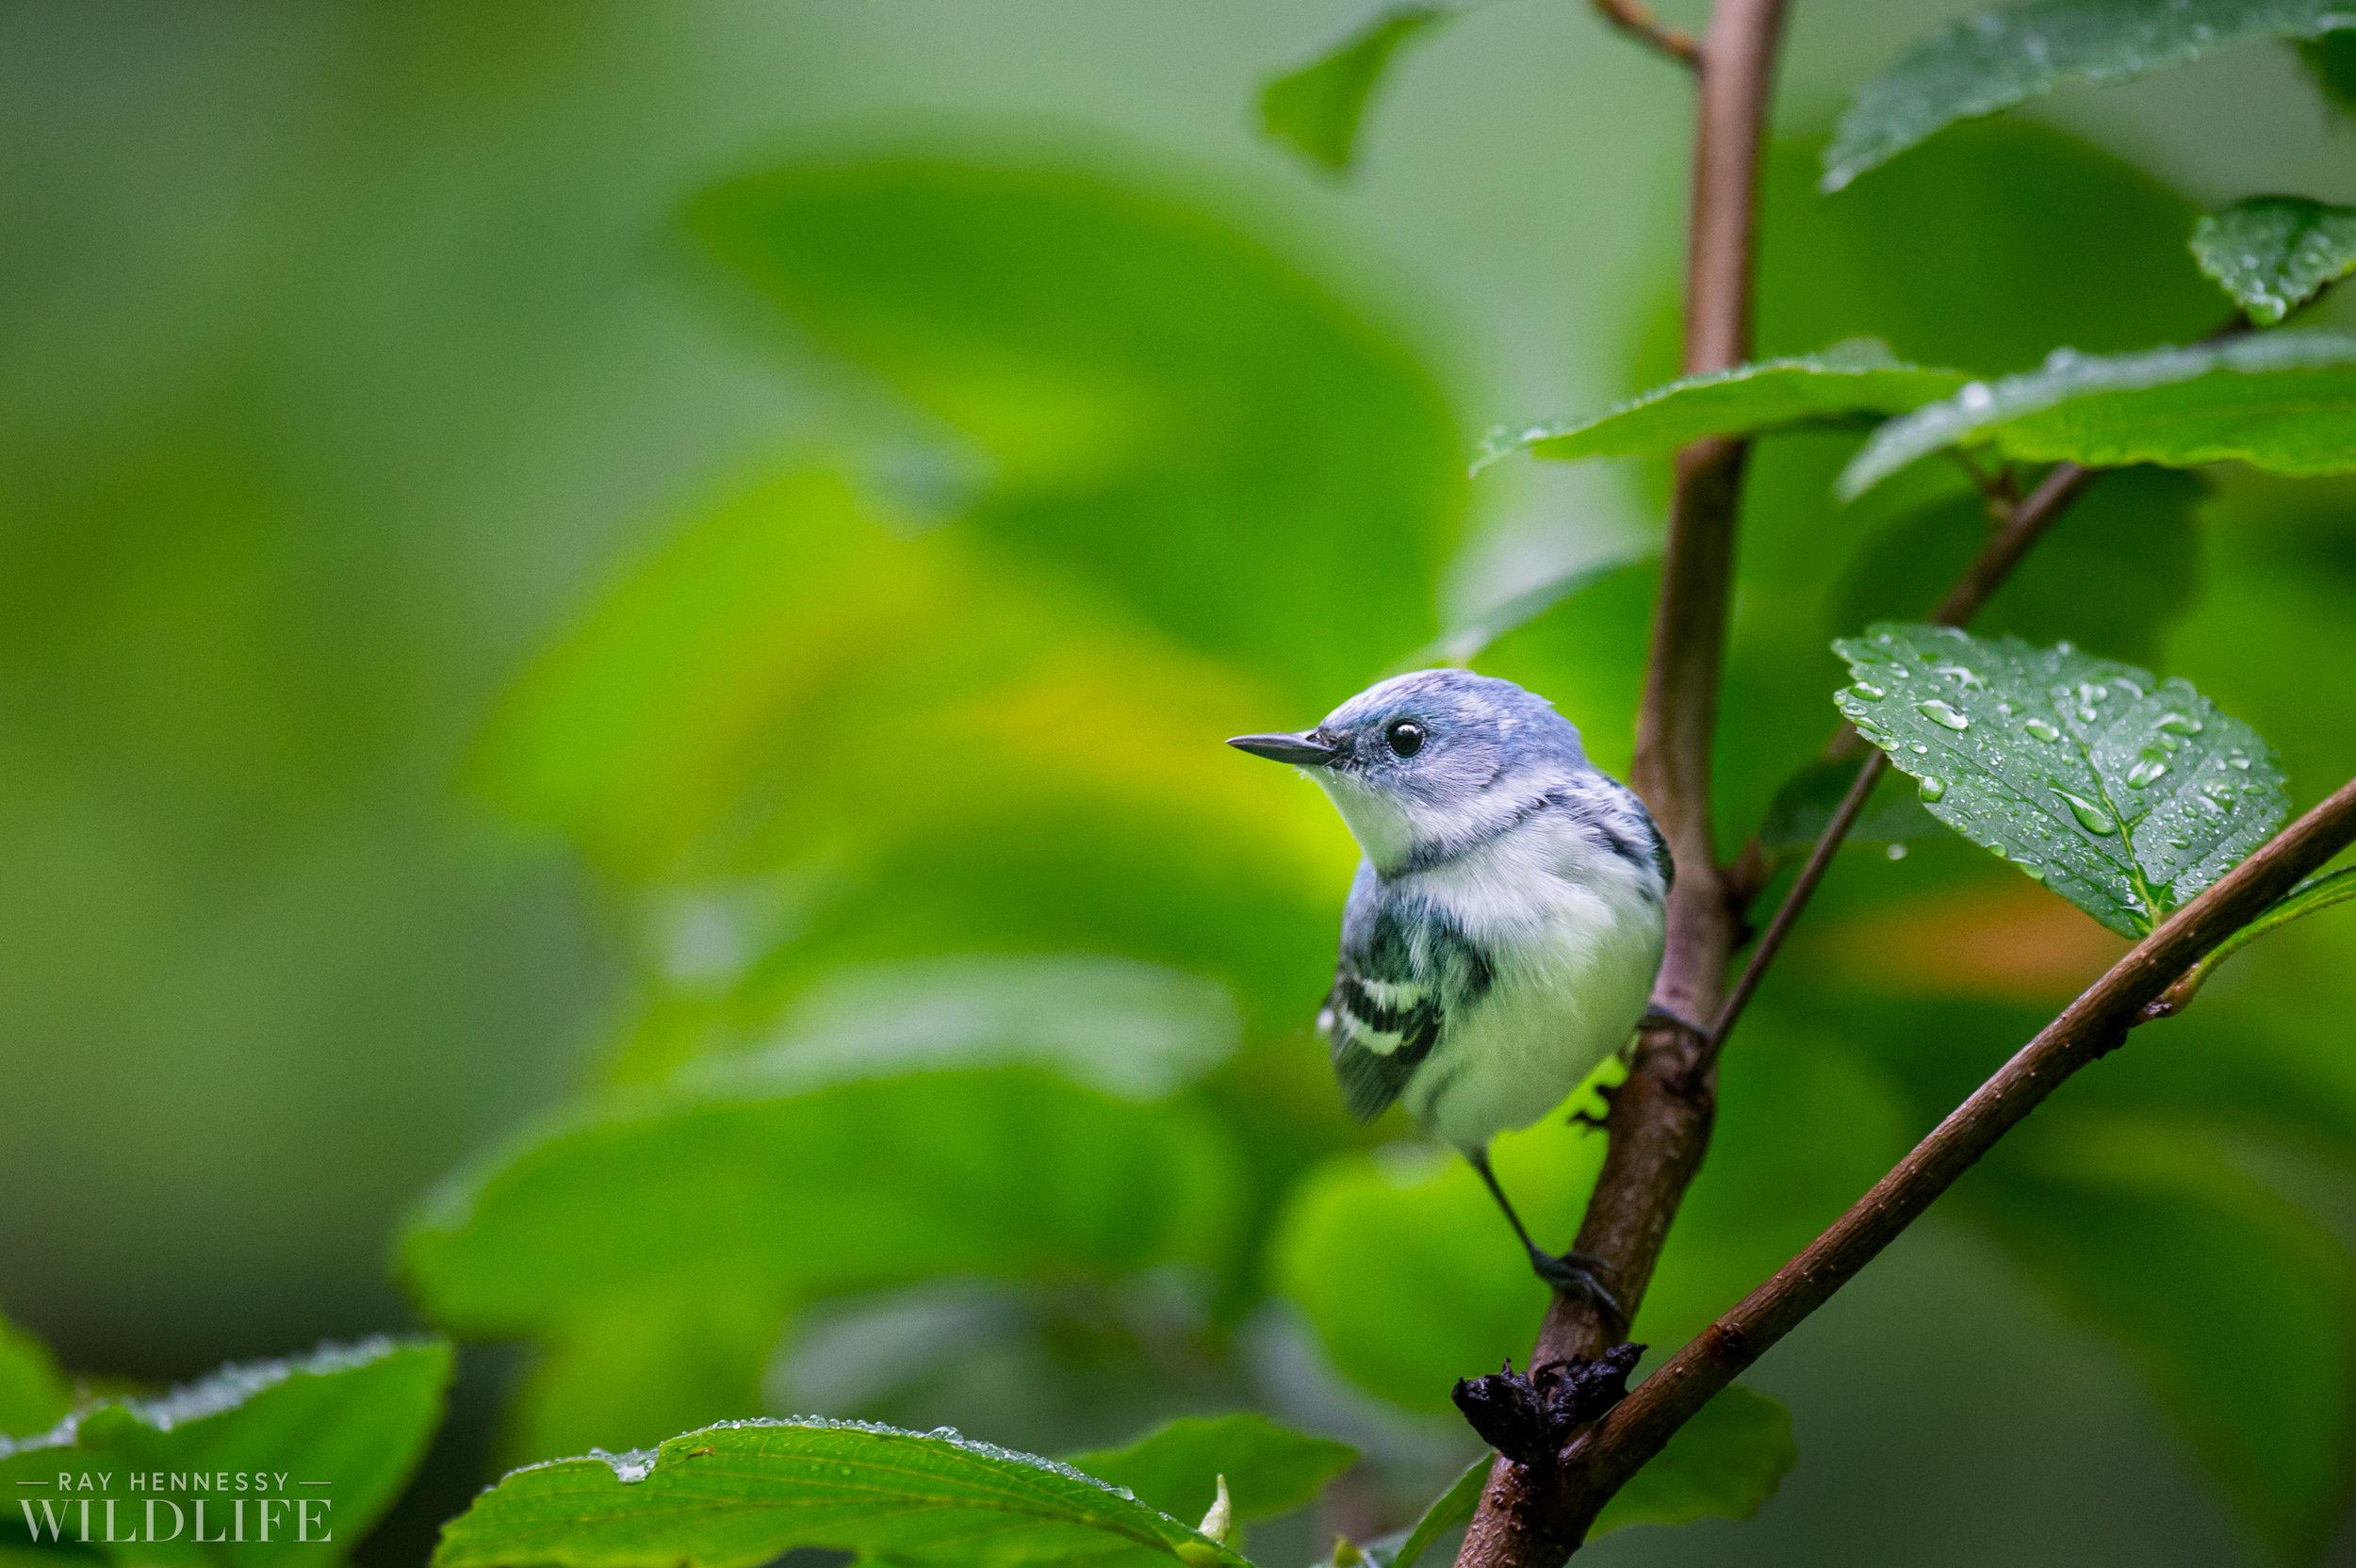 005_Cerulean Warbler.jpg